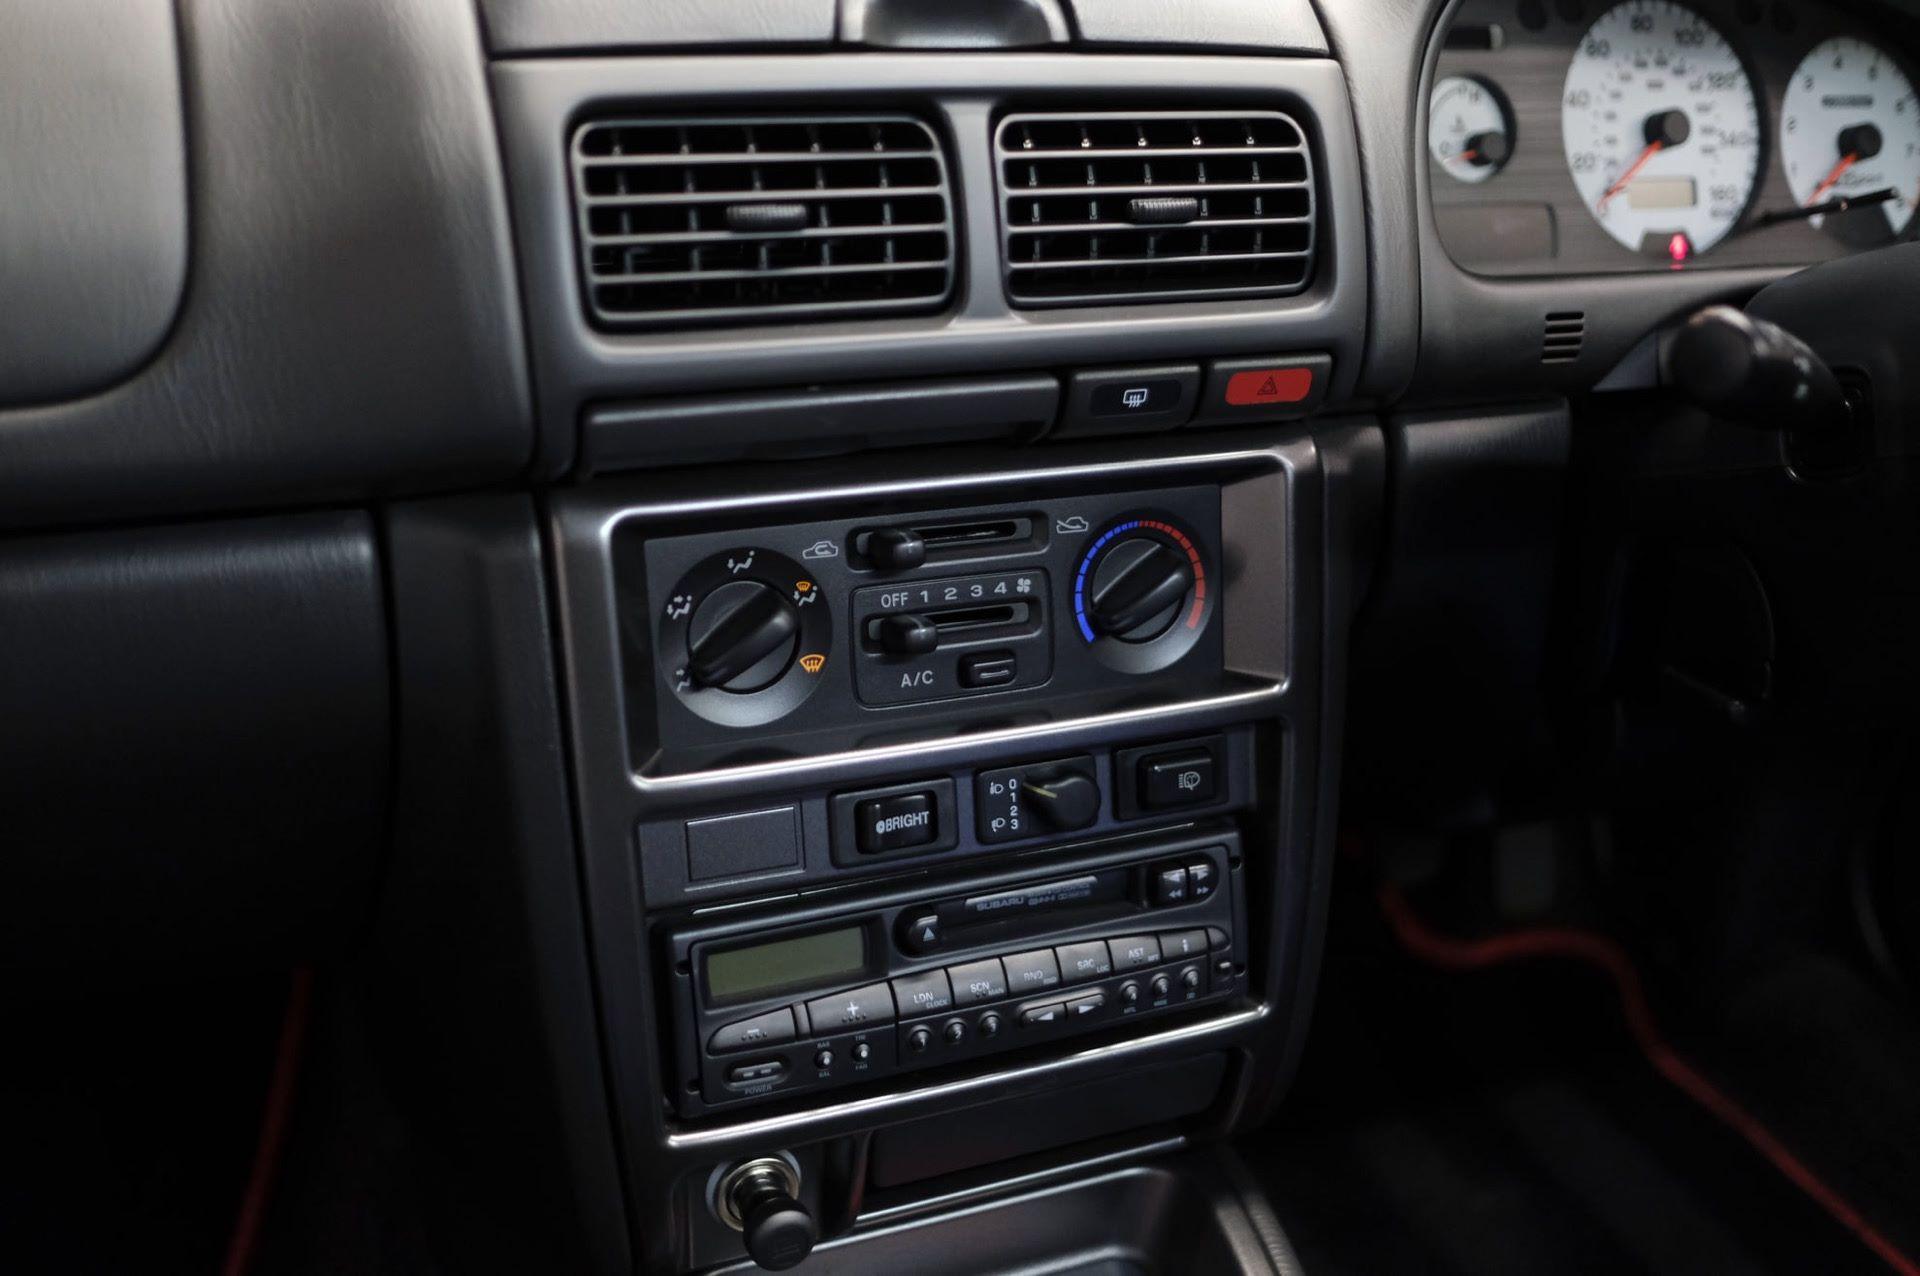 Subaru-Impreza-RB5-1999-21